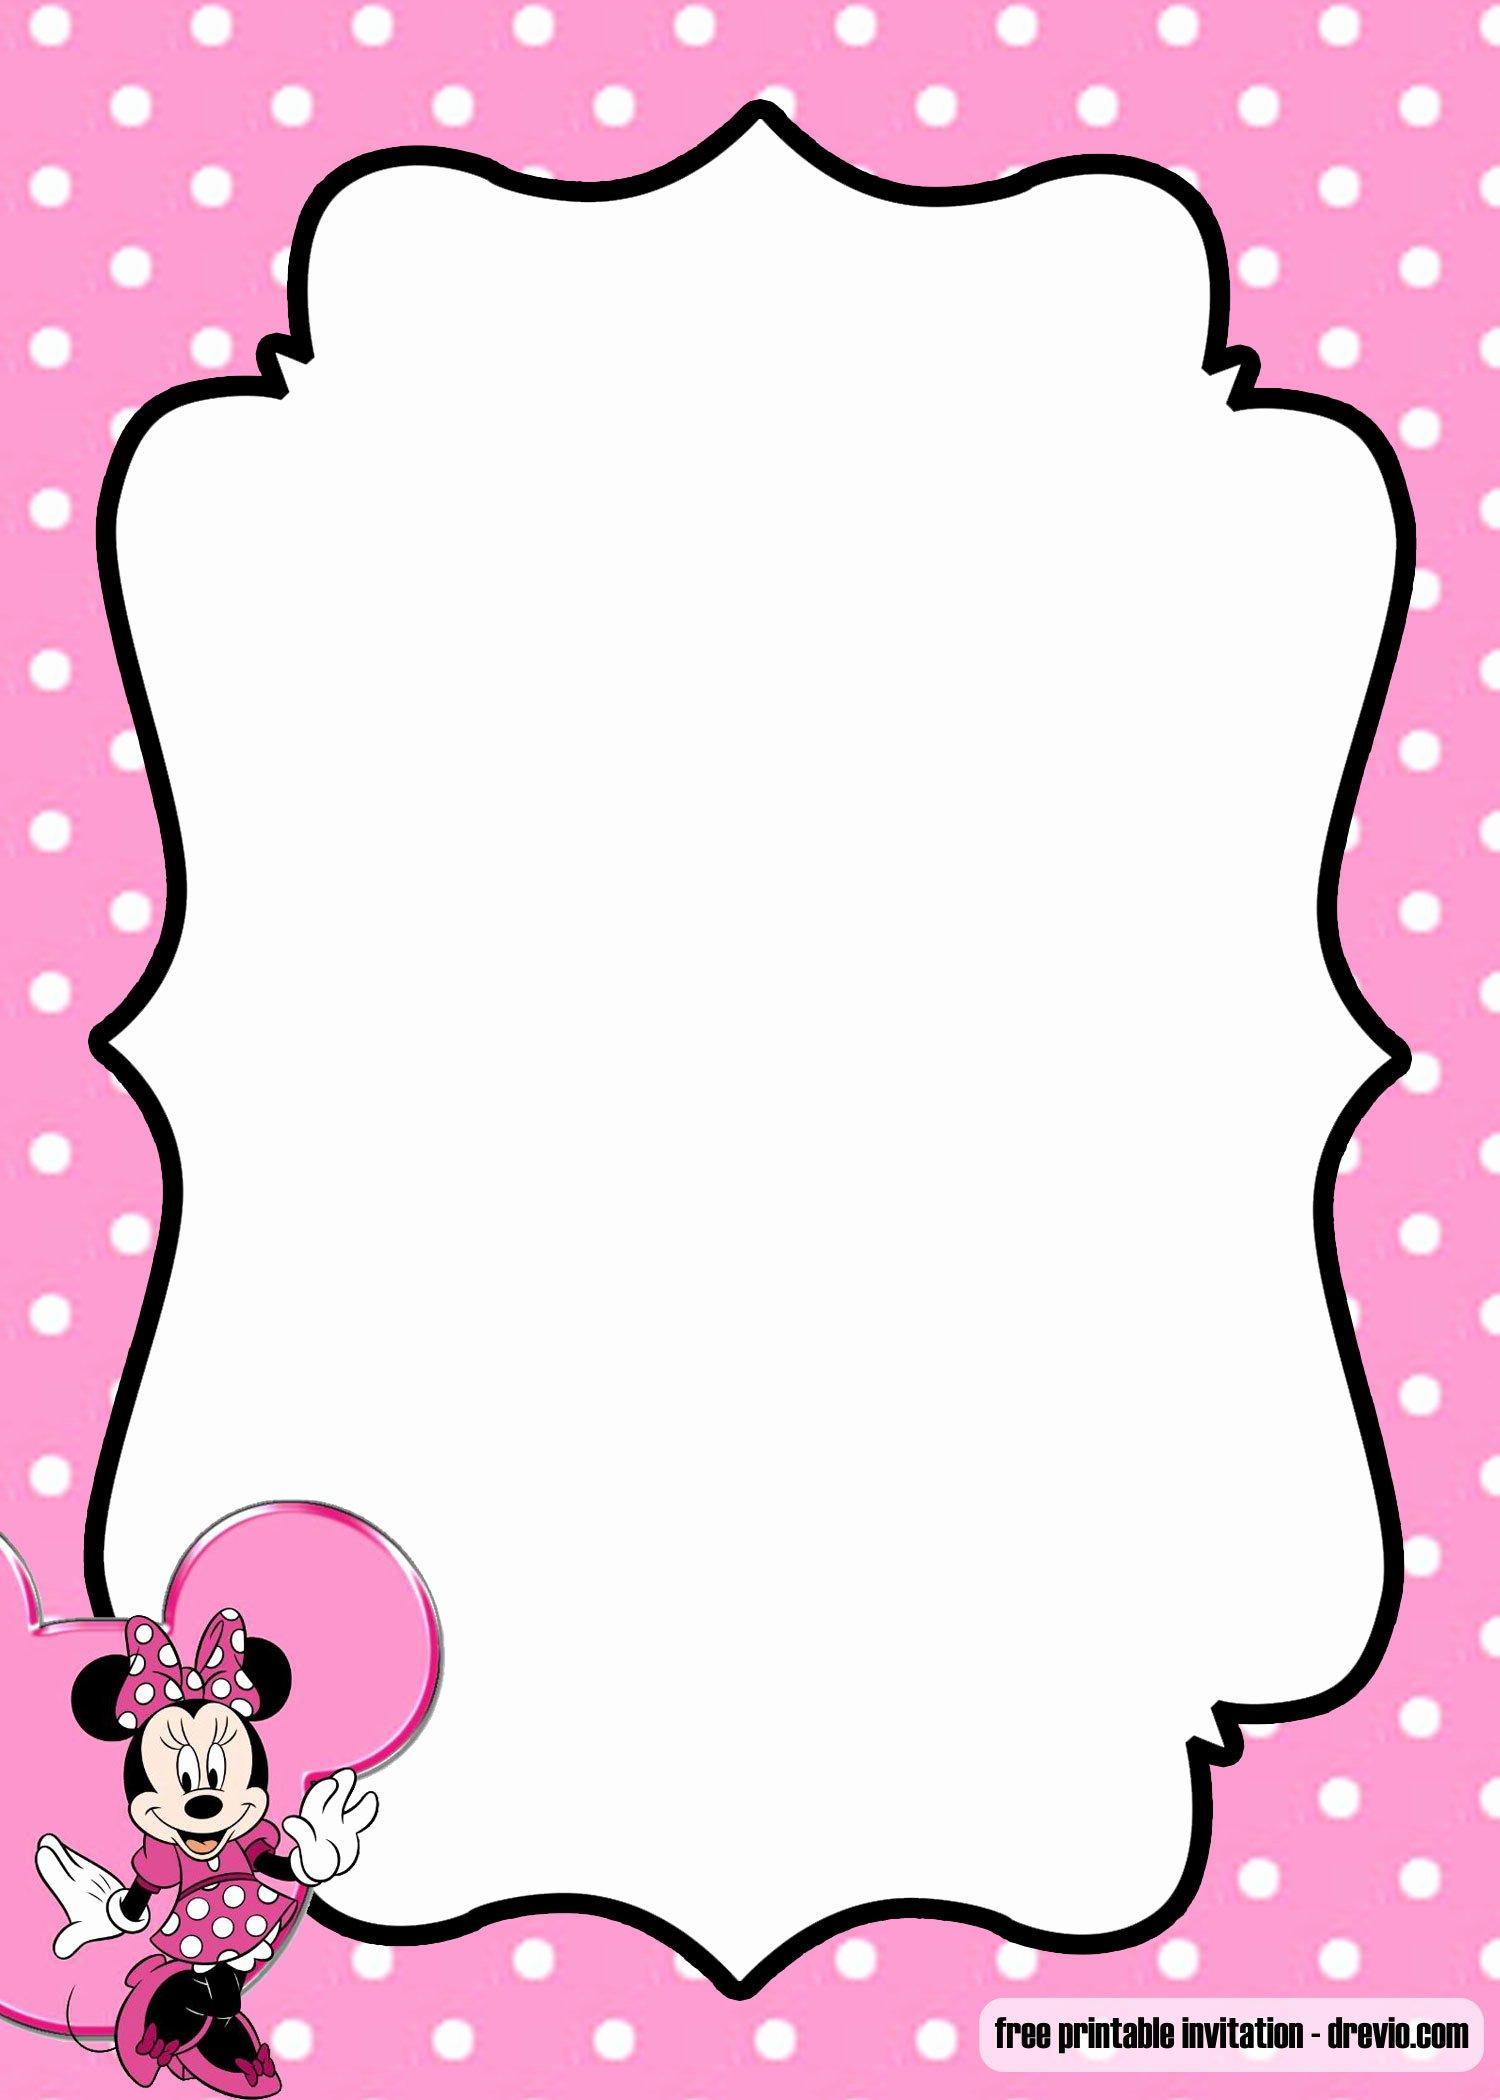 Polka Dot Invitation Template Lovely Free Minnie Mouse Kids Polkadot Invitation Templates